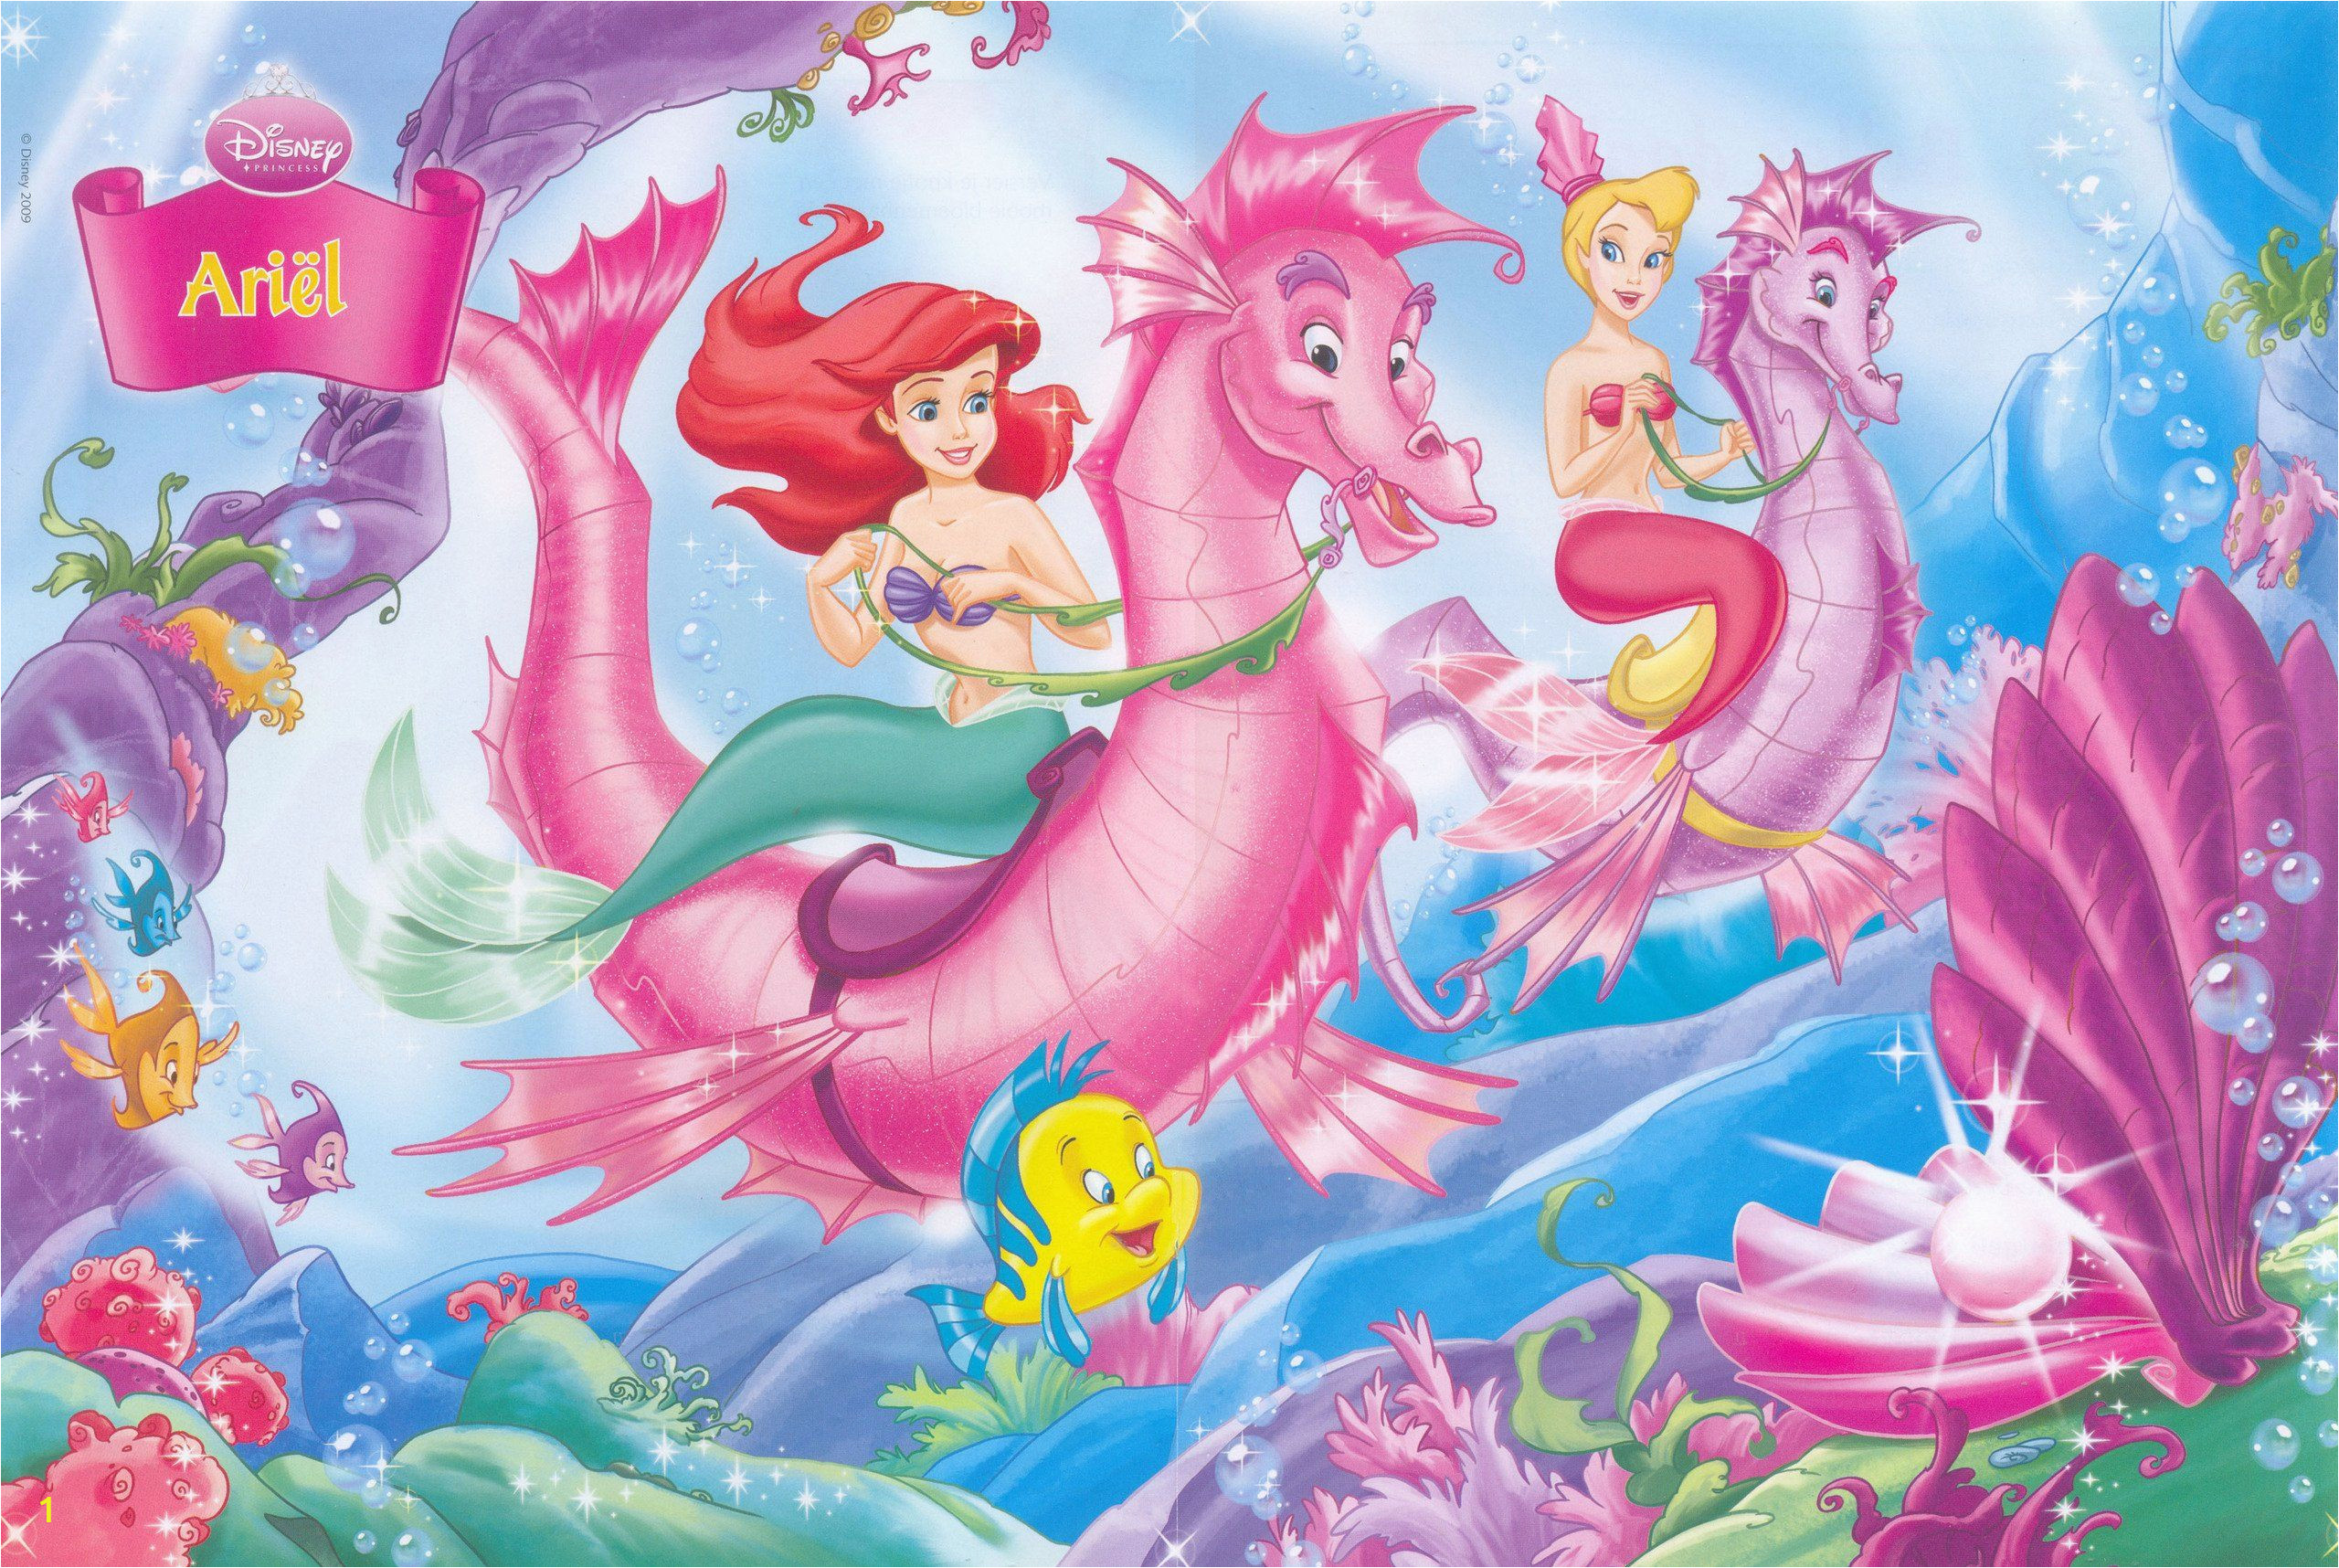 Disney Little Mermaid Wall Mural Little Mermaid Disney Fantasy Animation Cartoon Adventure